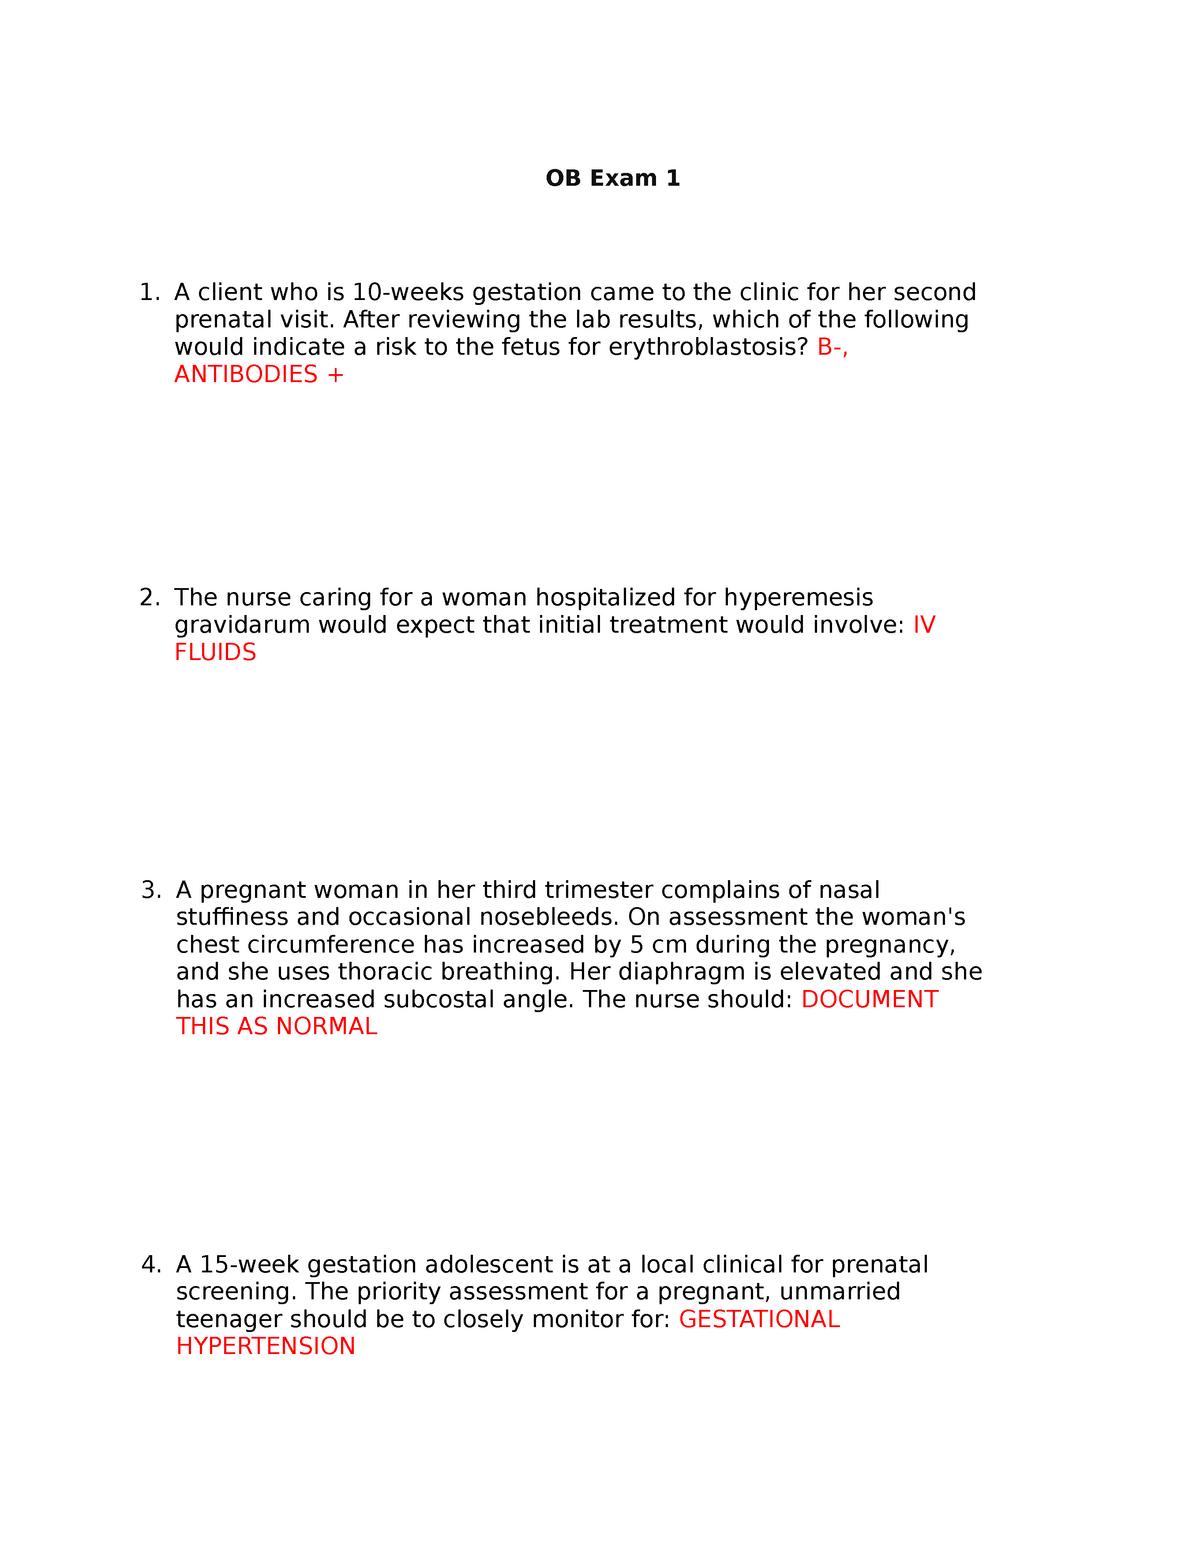 Exam 1 qs OB - practice questions - NUR 4130: Concepts Of Maternal